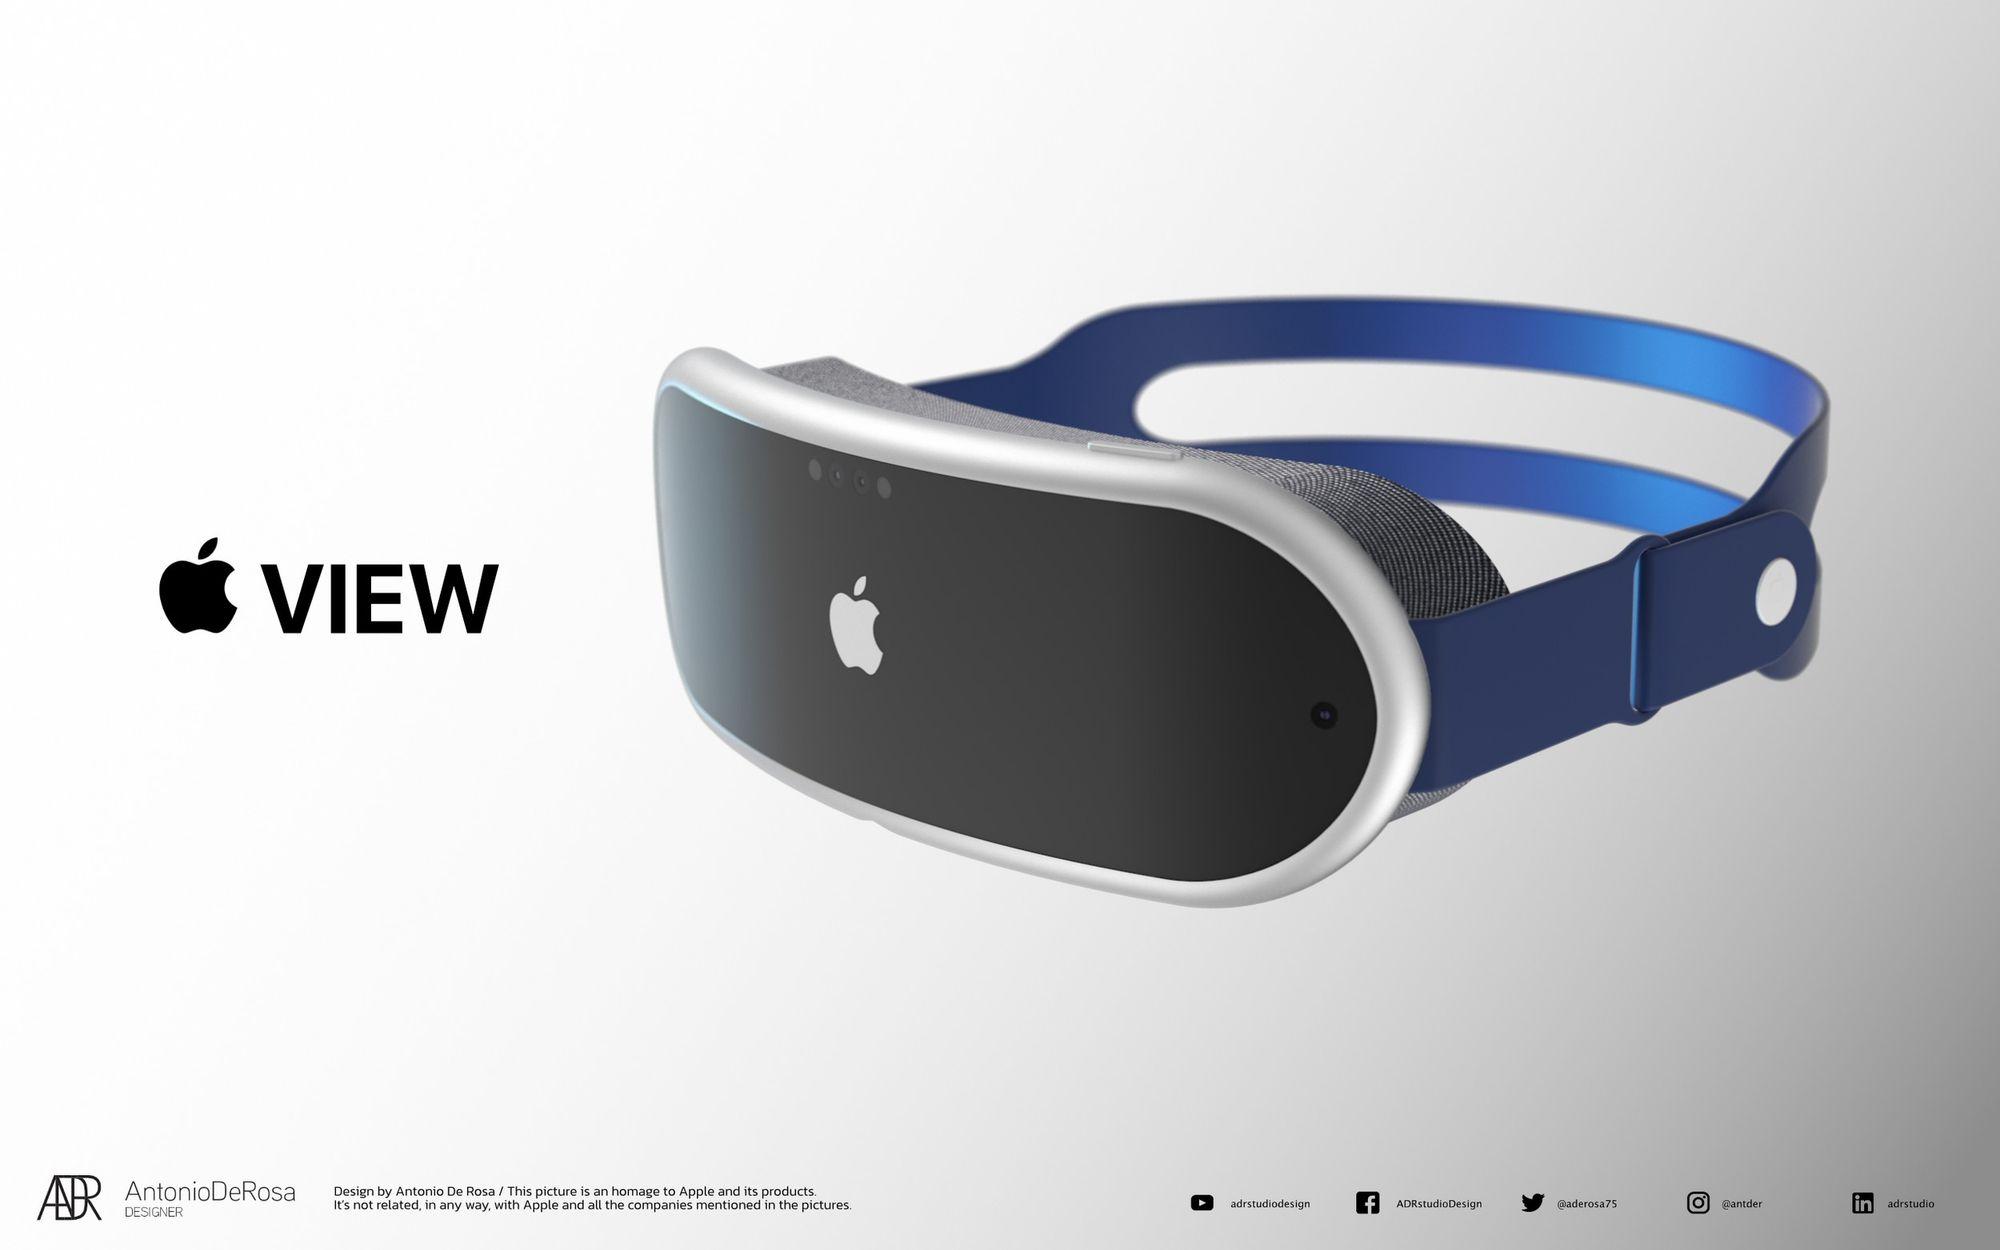 Apple View | Conceito de António de Rosa in Mac Rumors